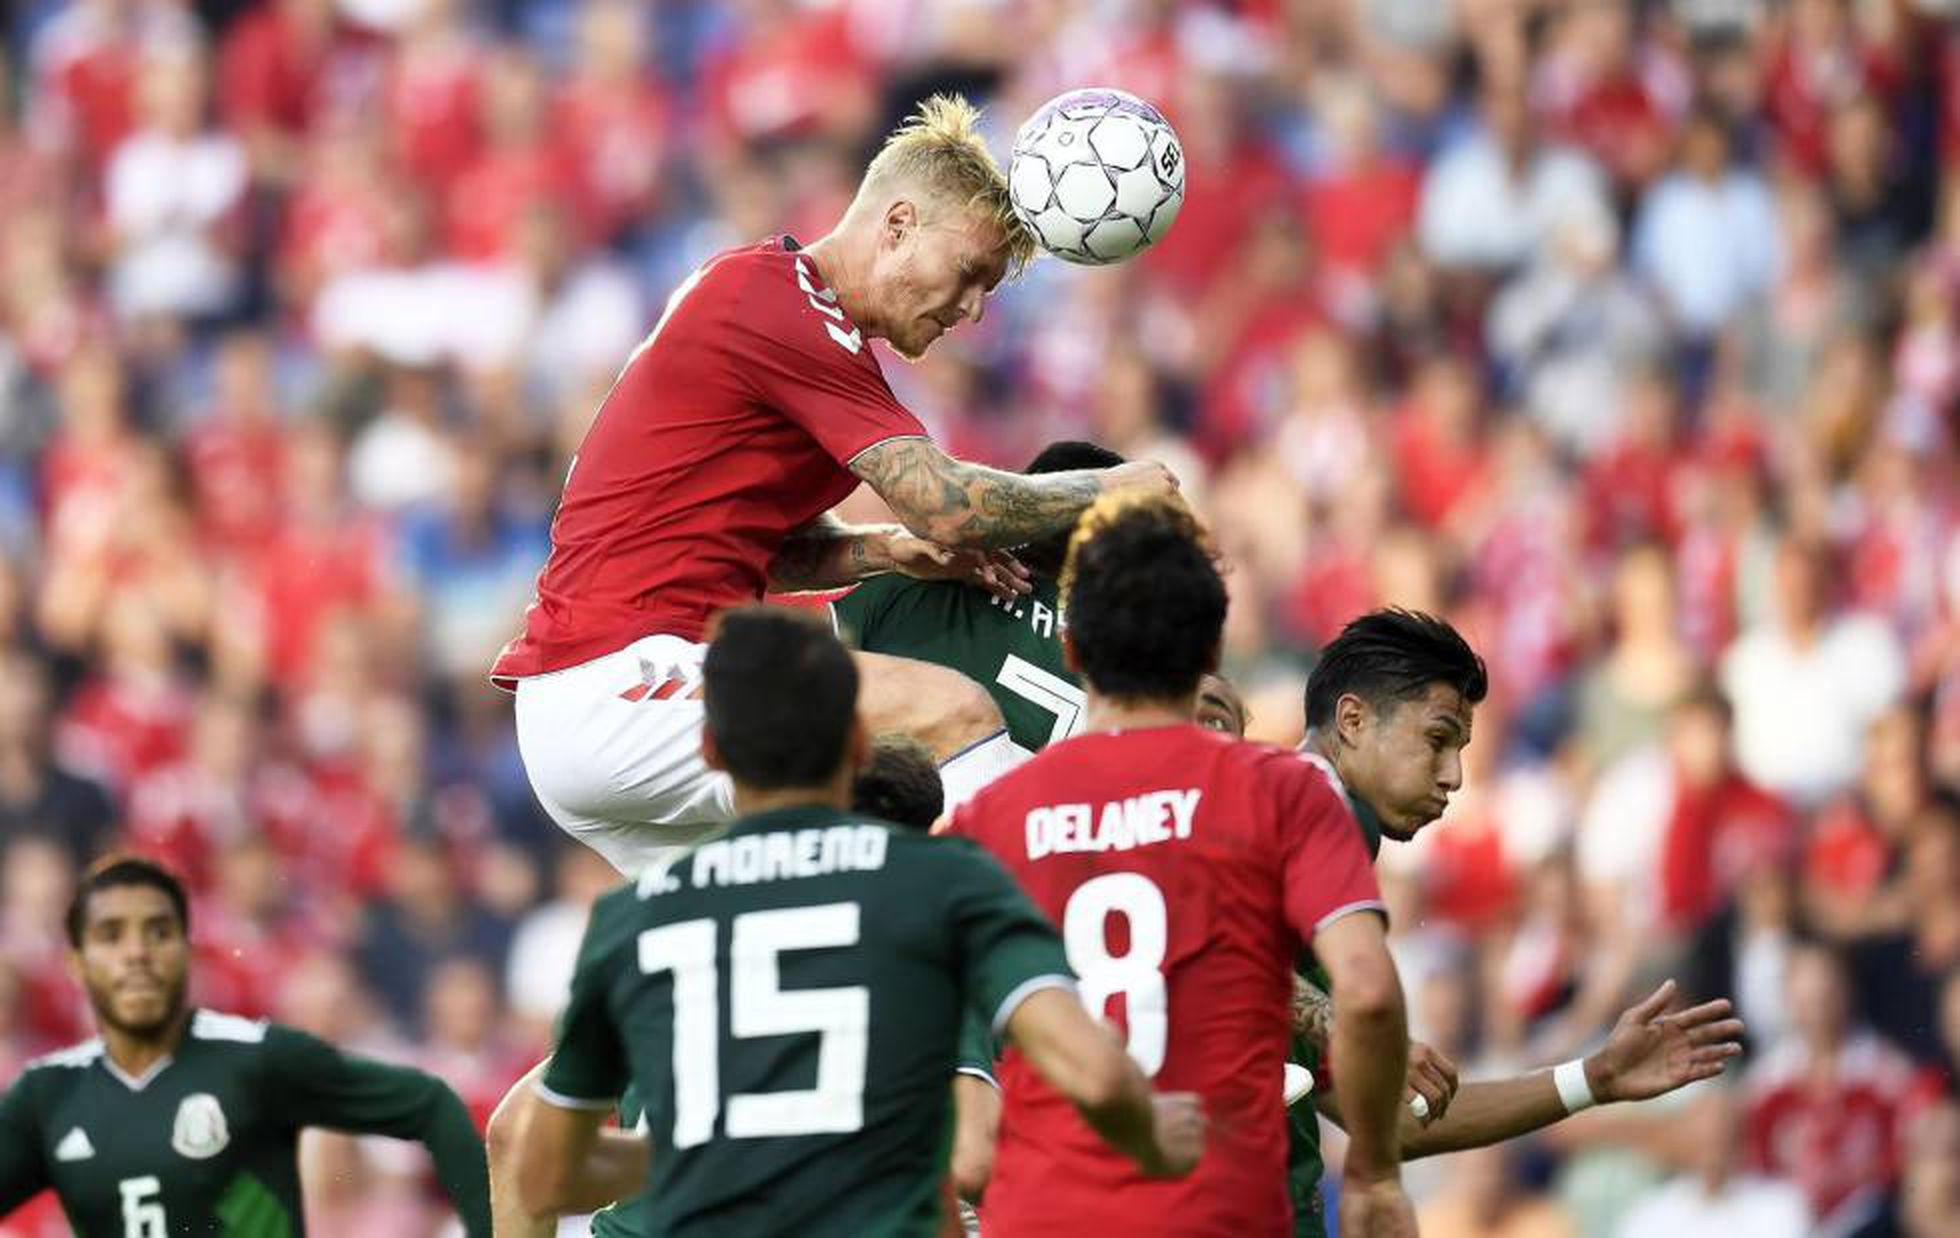 47.-Qatar-Eliminatorias.europeas-01092021-Dinamarca2-Escocia0.jpg